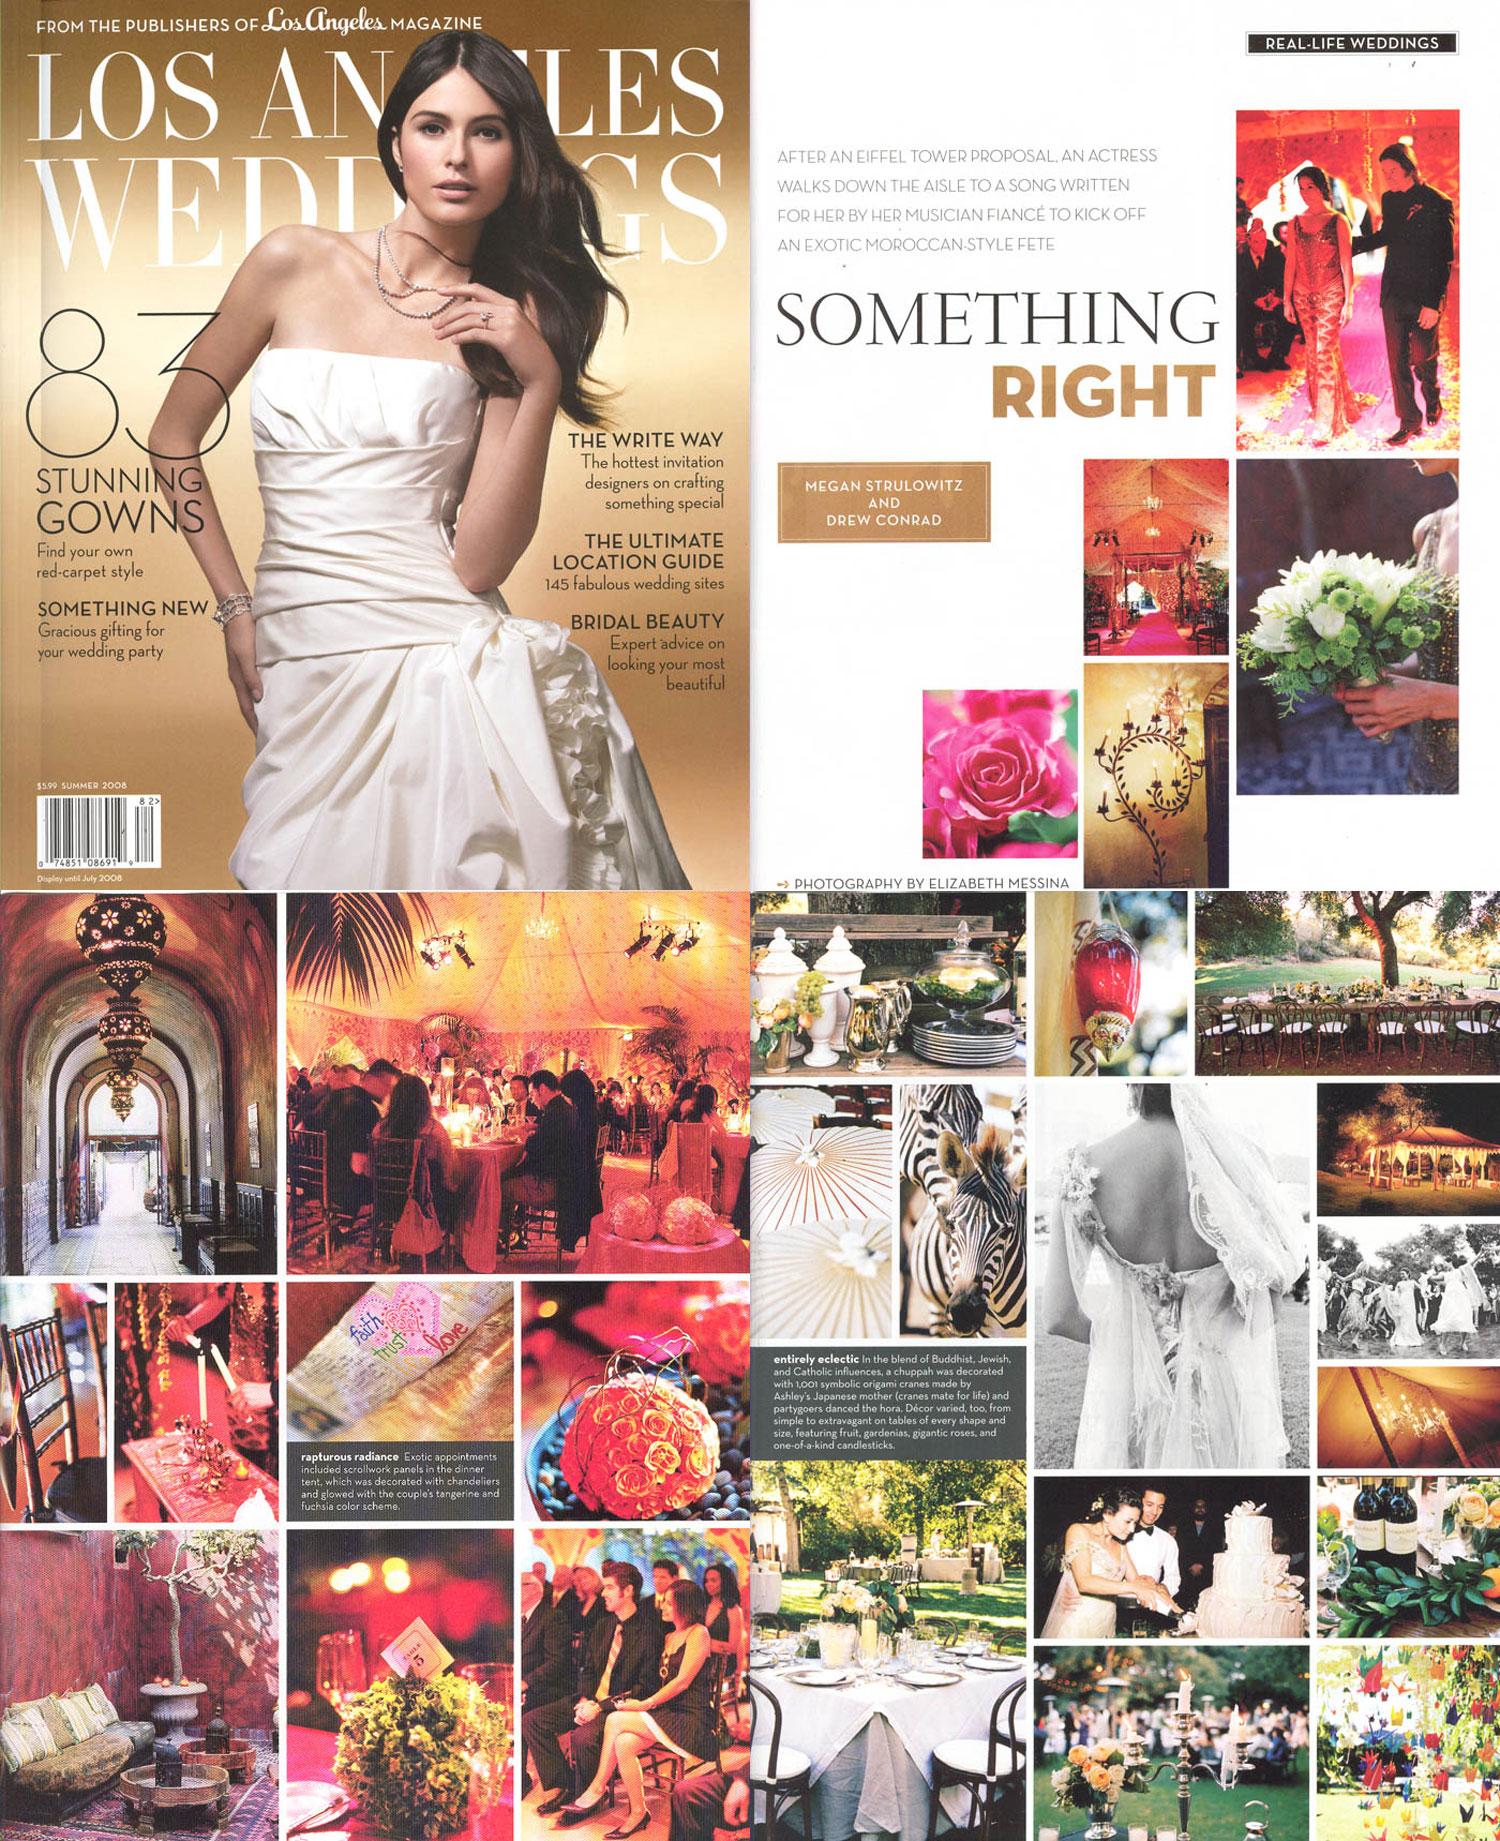 raj-tents-los-angeles-wedding-2008.jpg